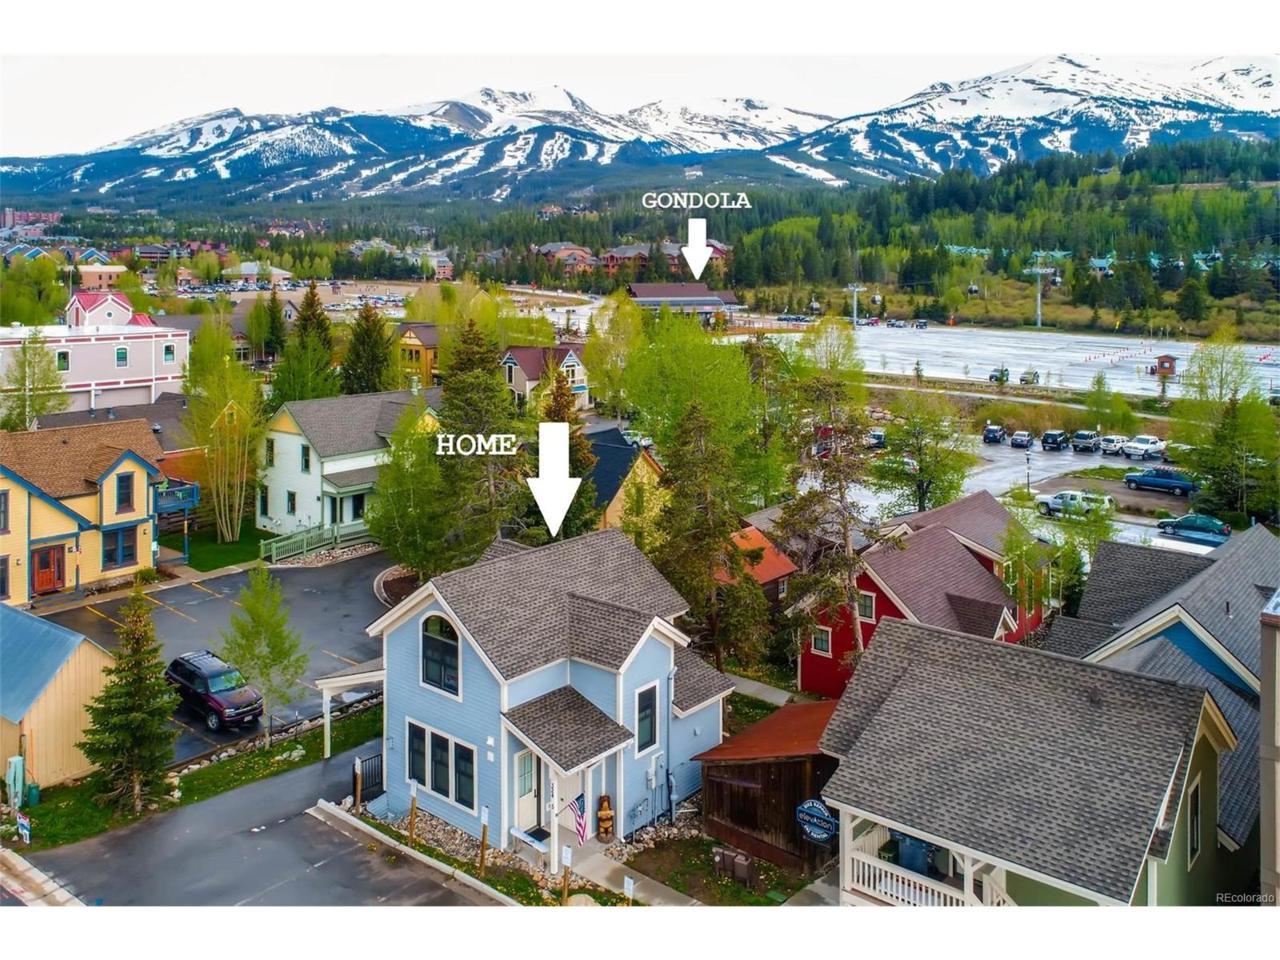 324 N Main Street, Breckenridge, CO 80424 (MLS #4347526) :: 8z Real Estate